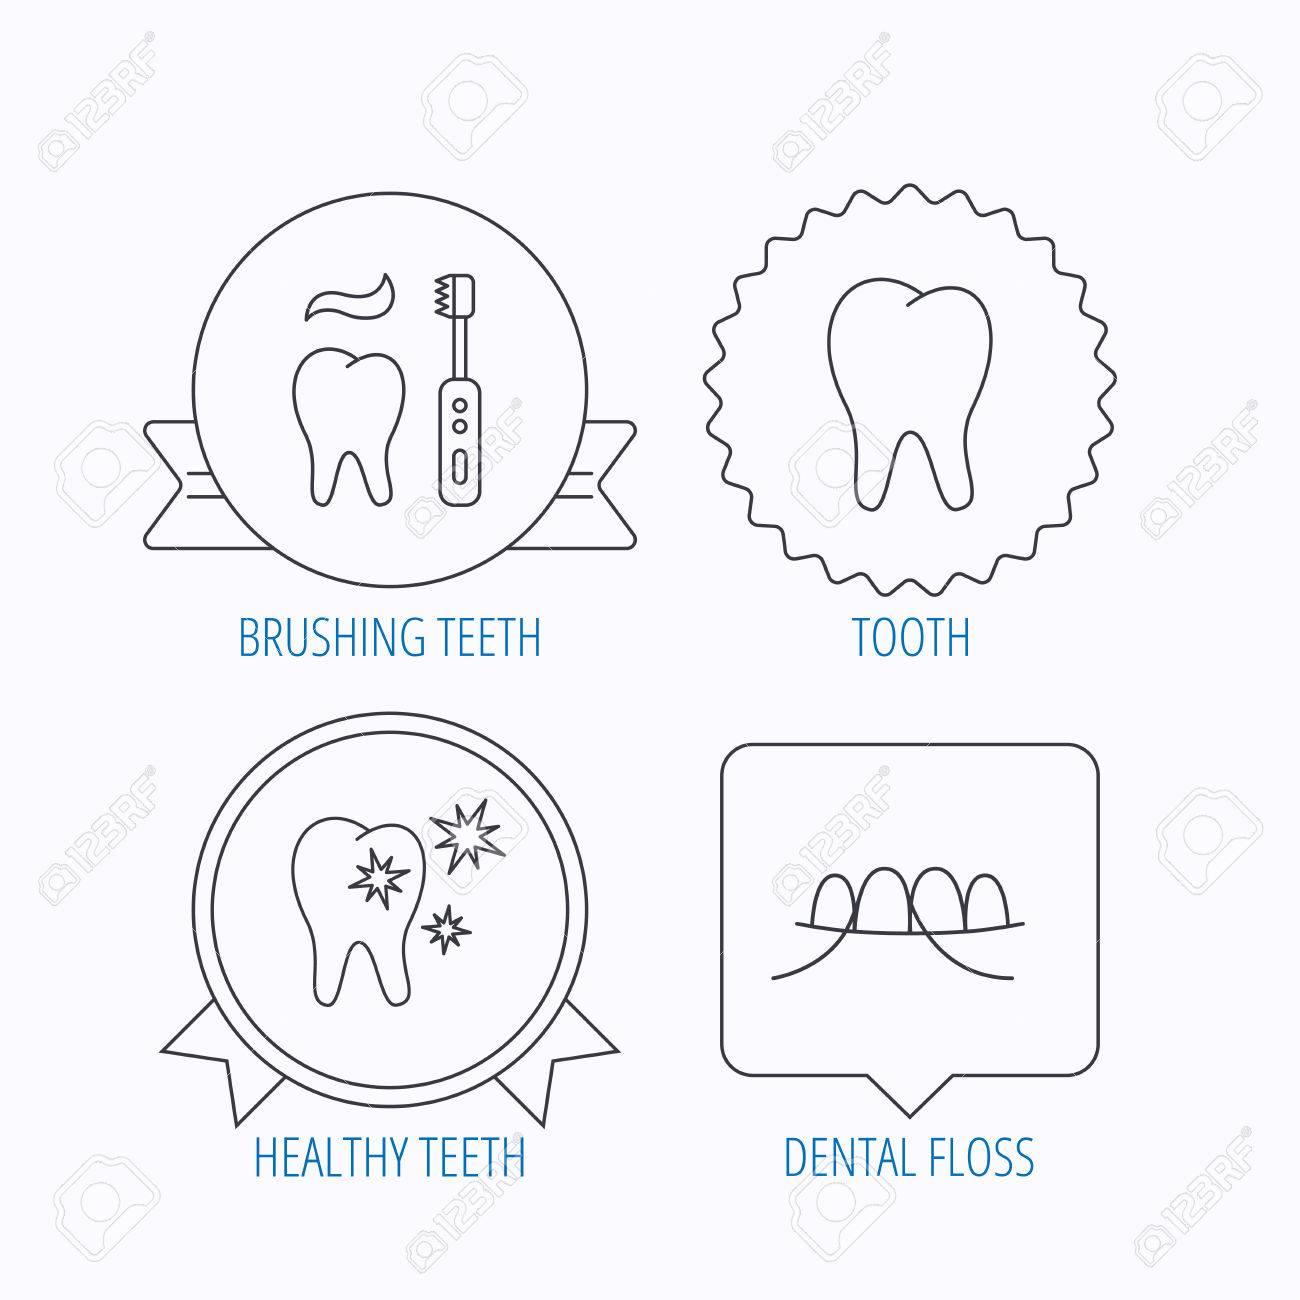 Dental Floss Tooth And Healthy Teeth Icons Brushing Teeth Linear